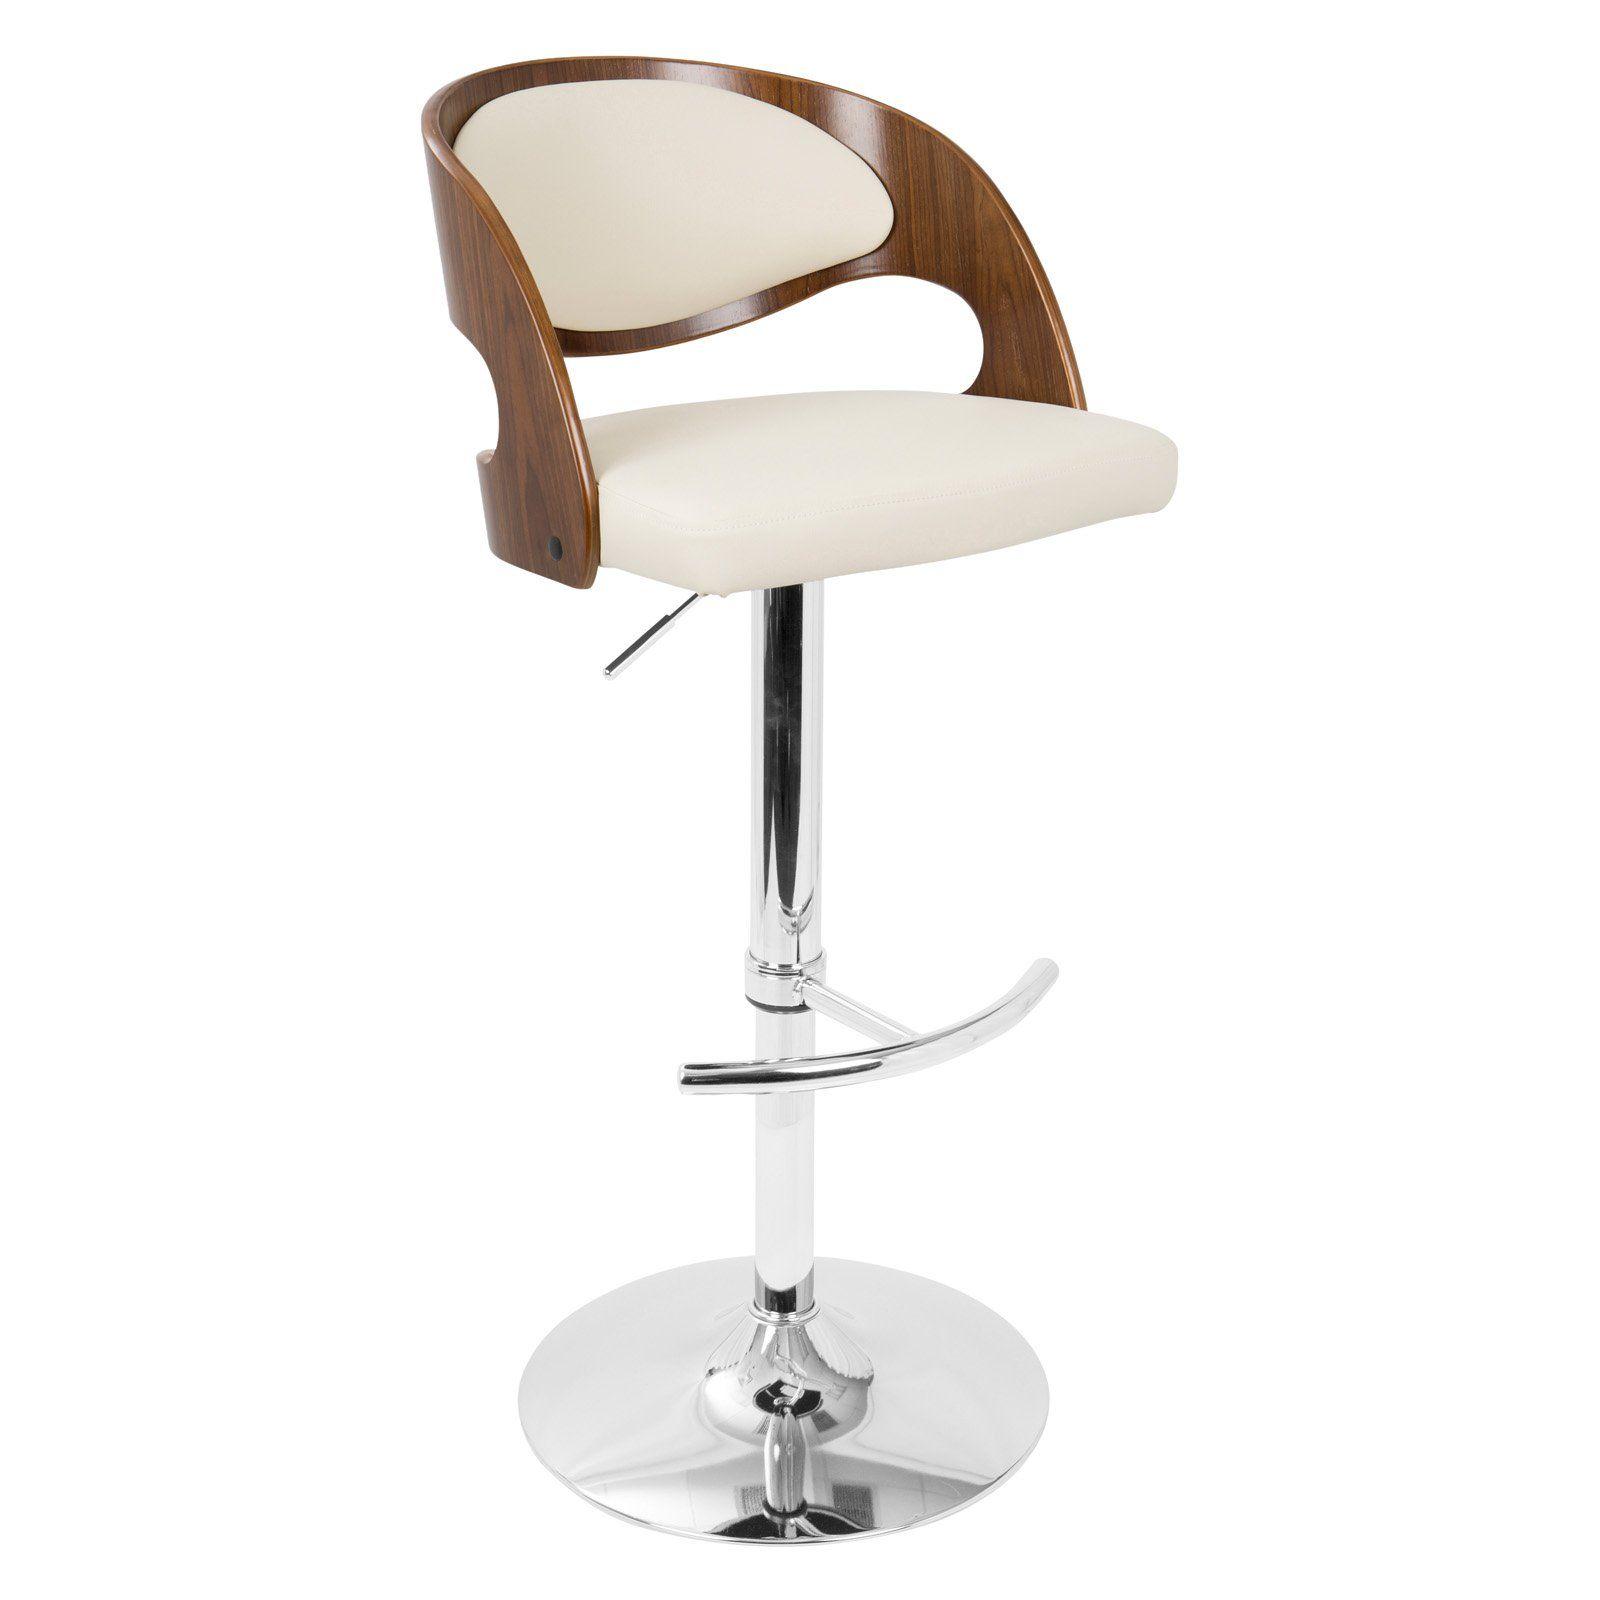 Strange Lumisource Pino Mid Century Modern Adjustable Bar Stool Machost Co Dining Chair Design Ideas Machostcouk